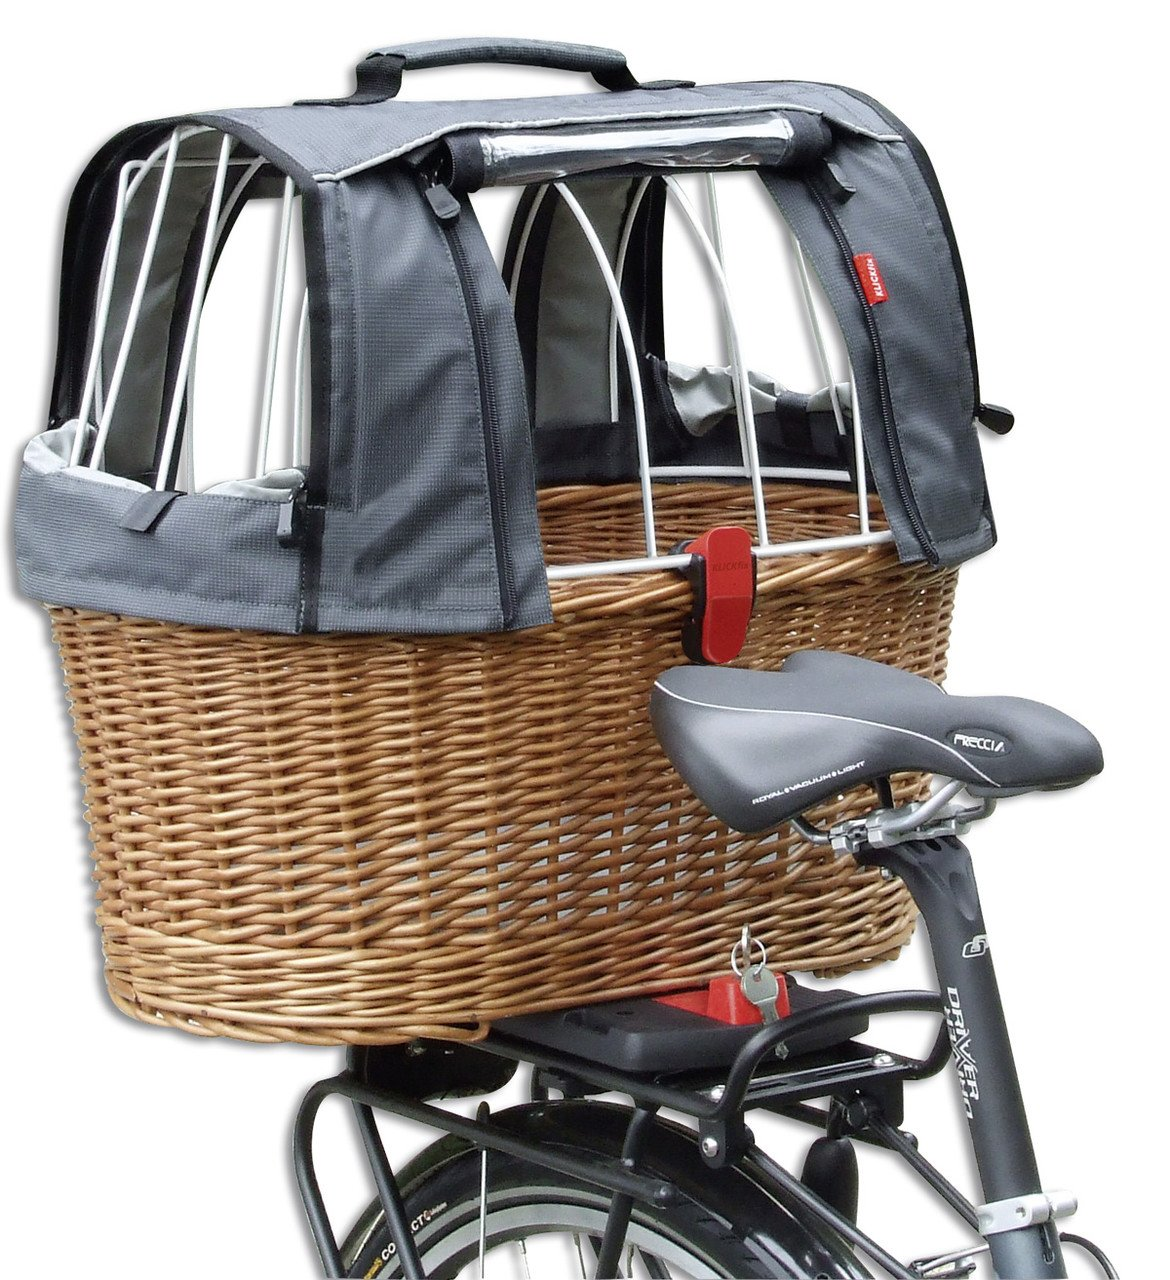 KlickFix rear basket Rixen & Kaul Doggy Basket Plus Fix